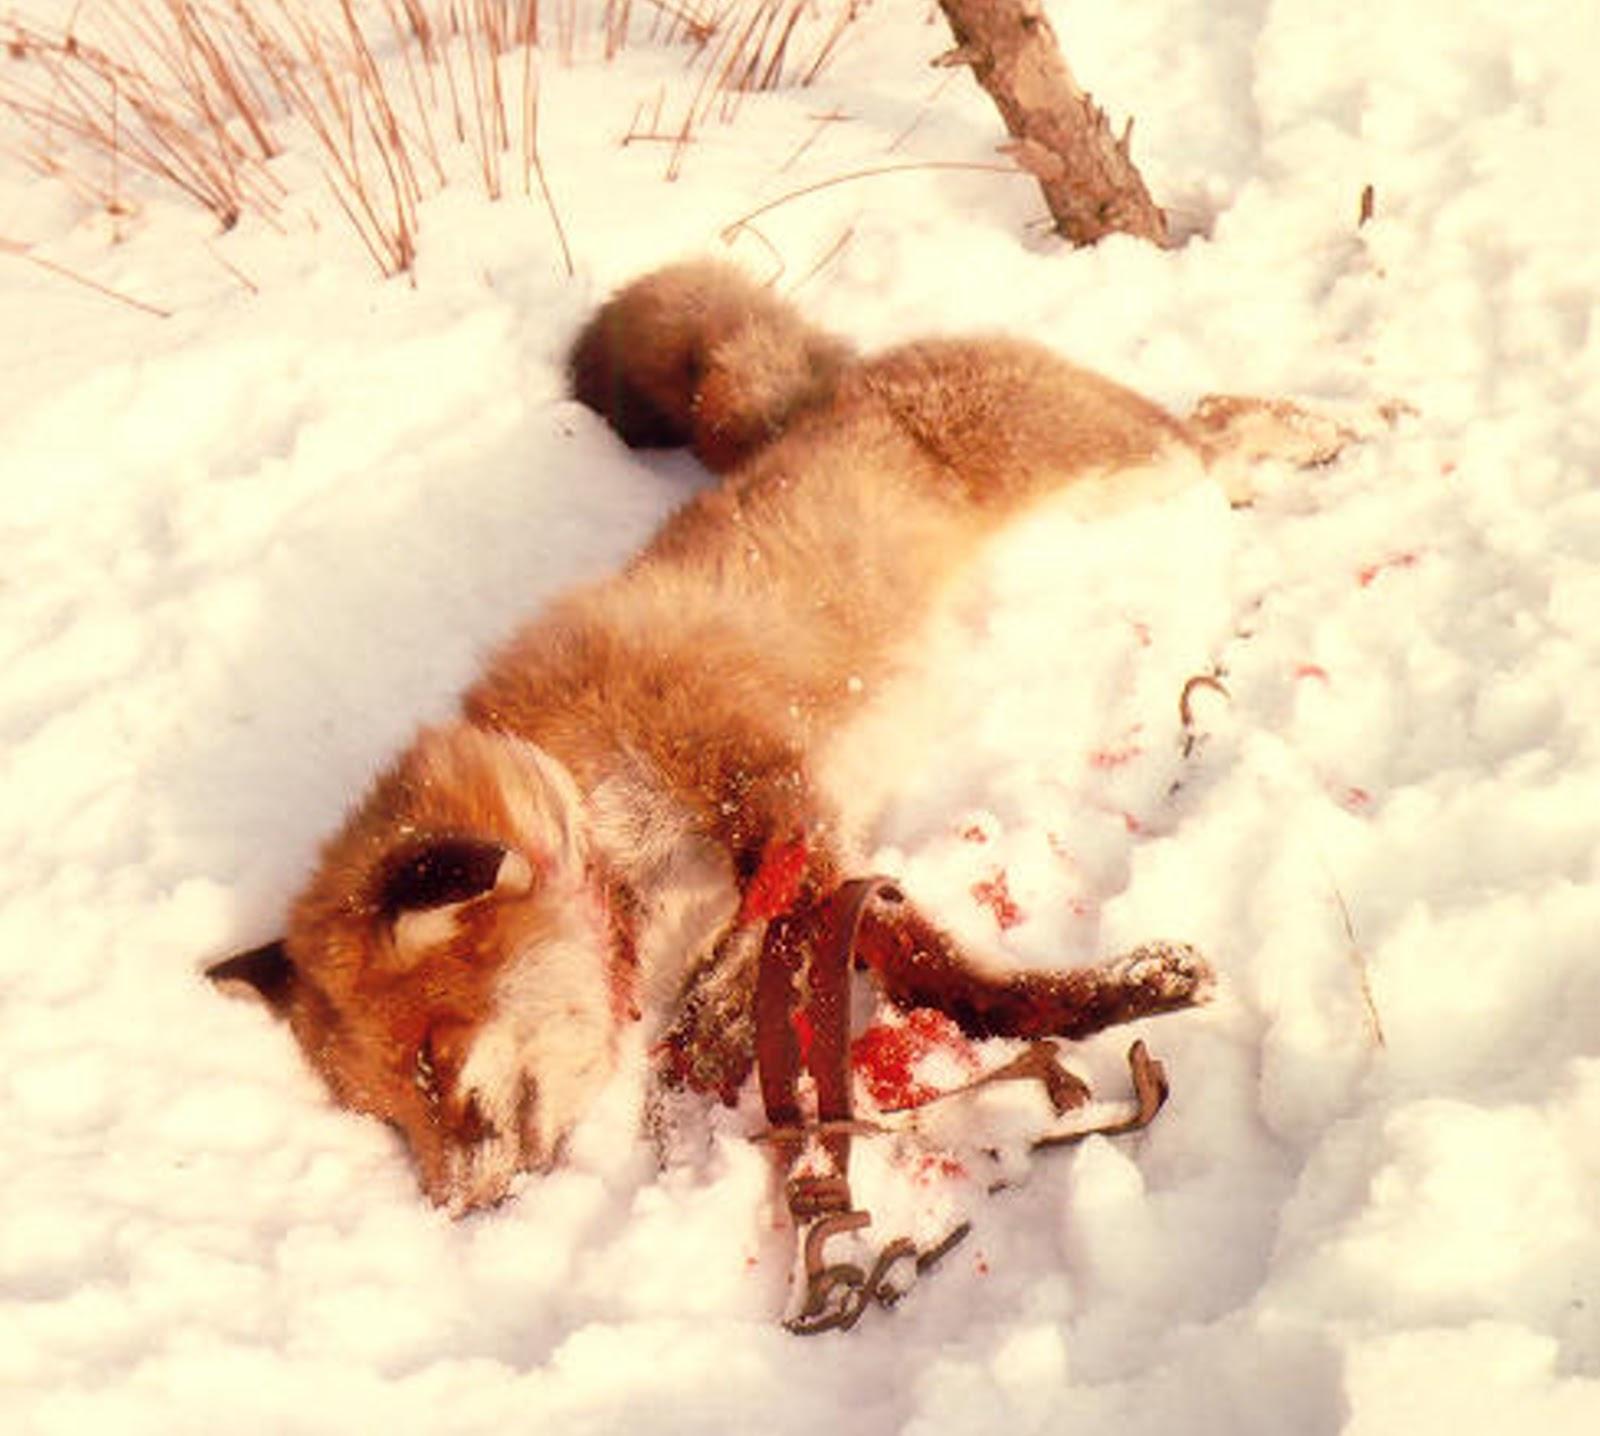 http://1.bp.blogspot.com/-gyOr-LFb24g/T0tmYNFA9dI/AAAAAAAAHDo/dZ2CiekRweU/s1600/Fuchs+in+Falle+3+W+Proehl.jpg